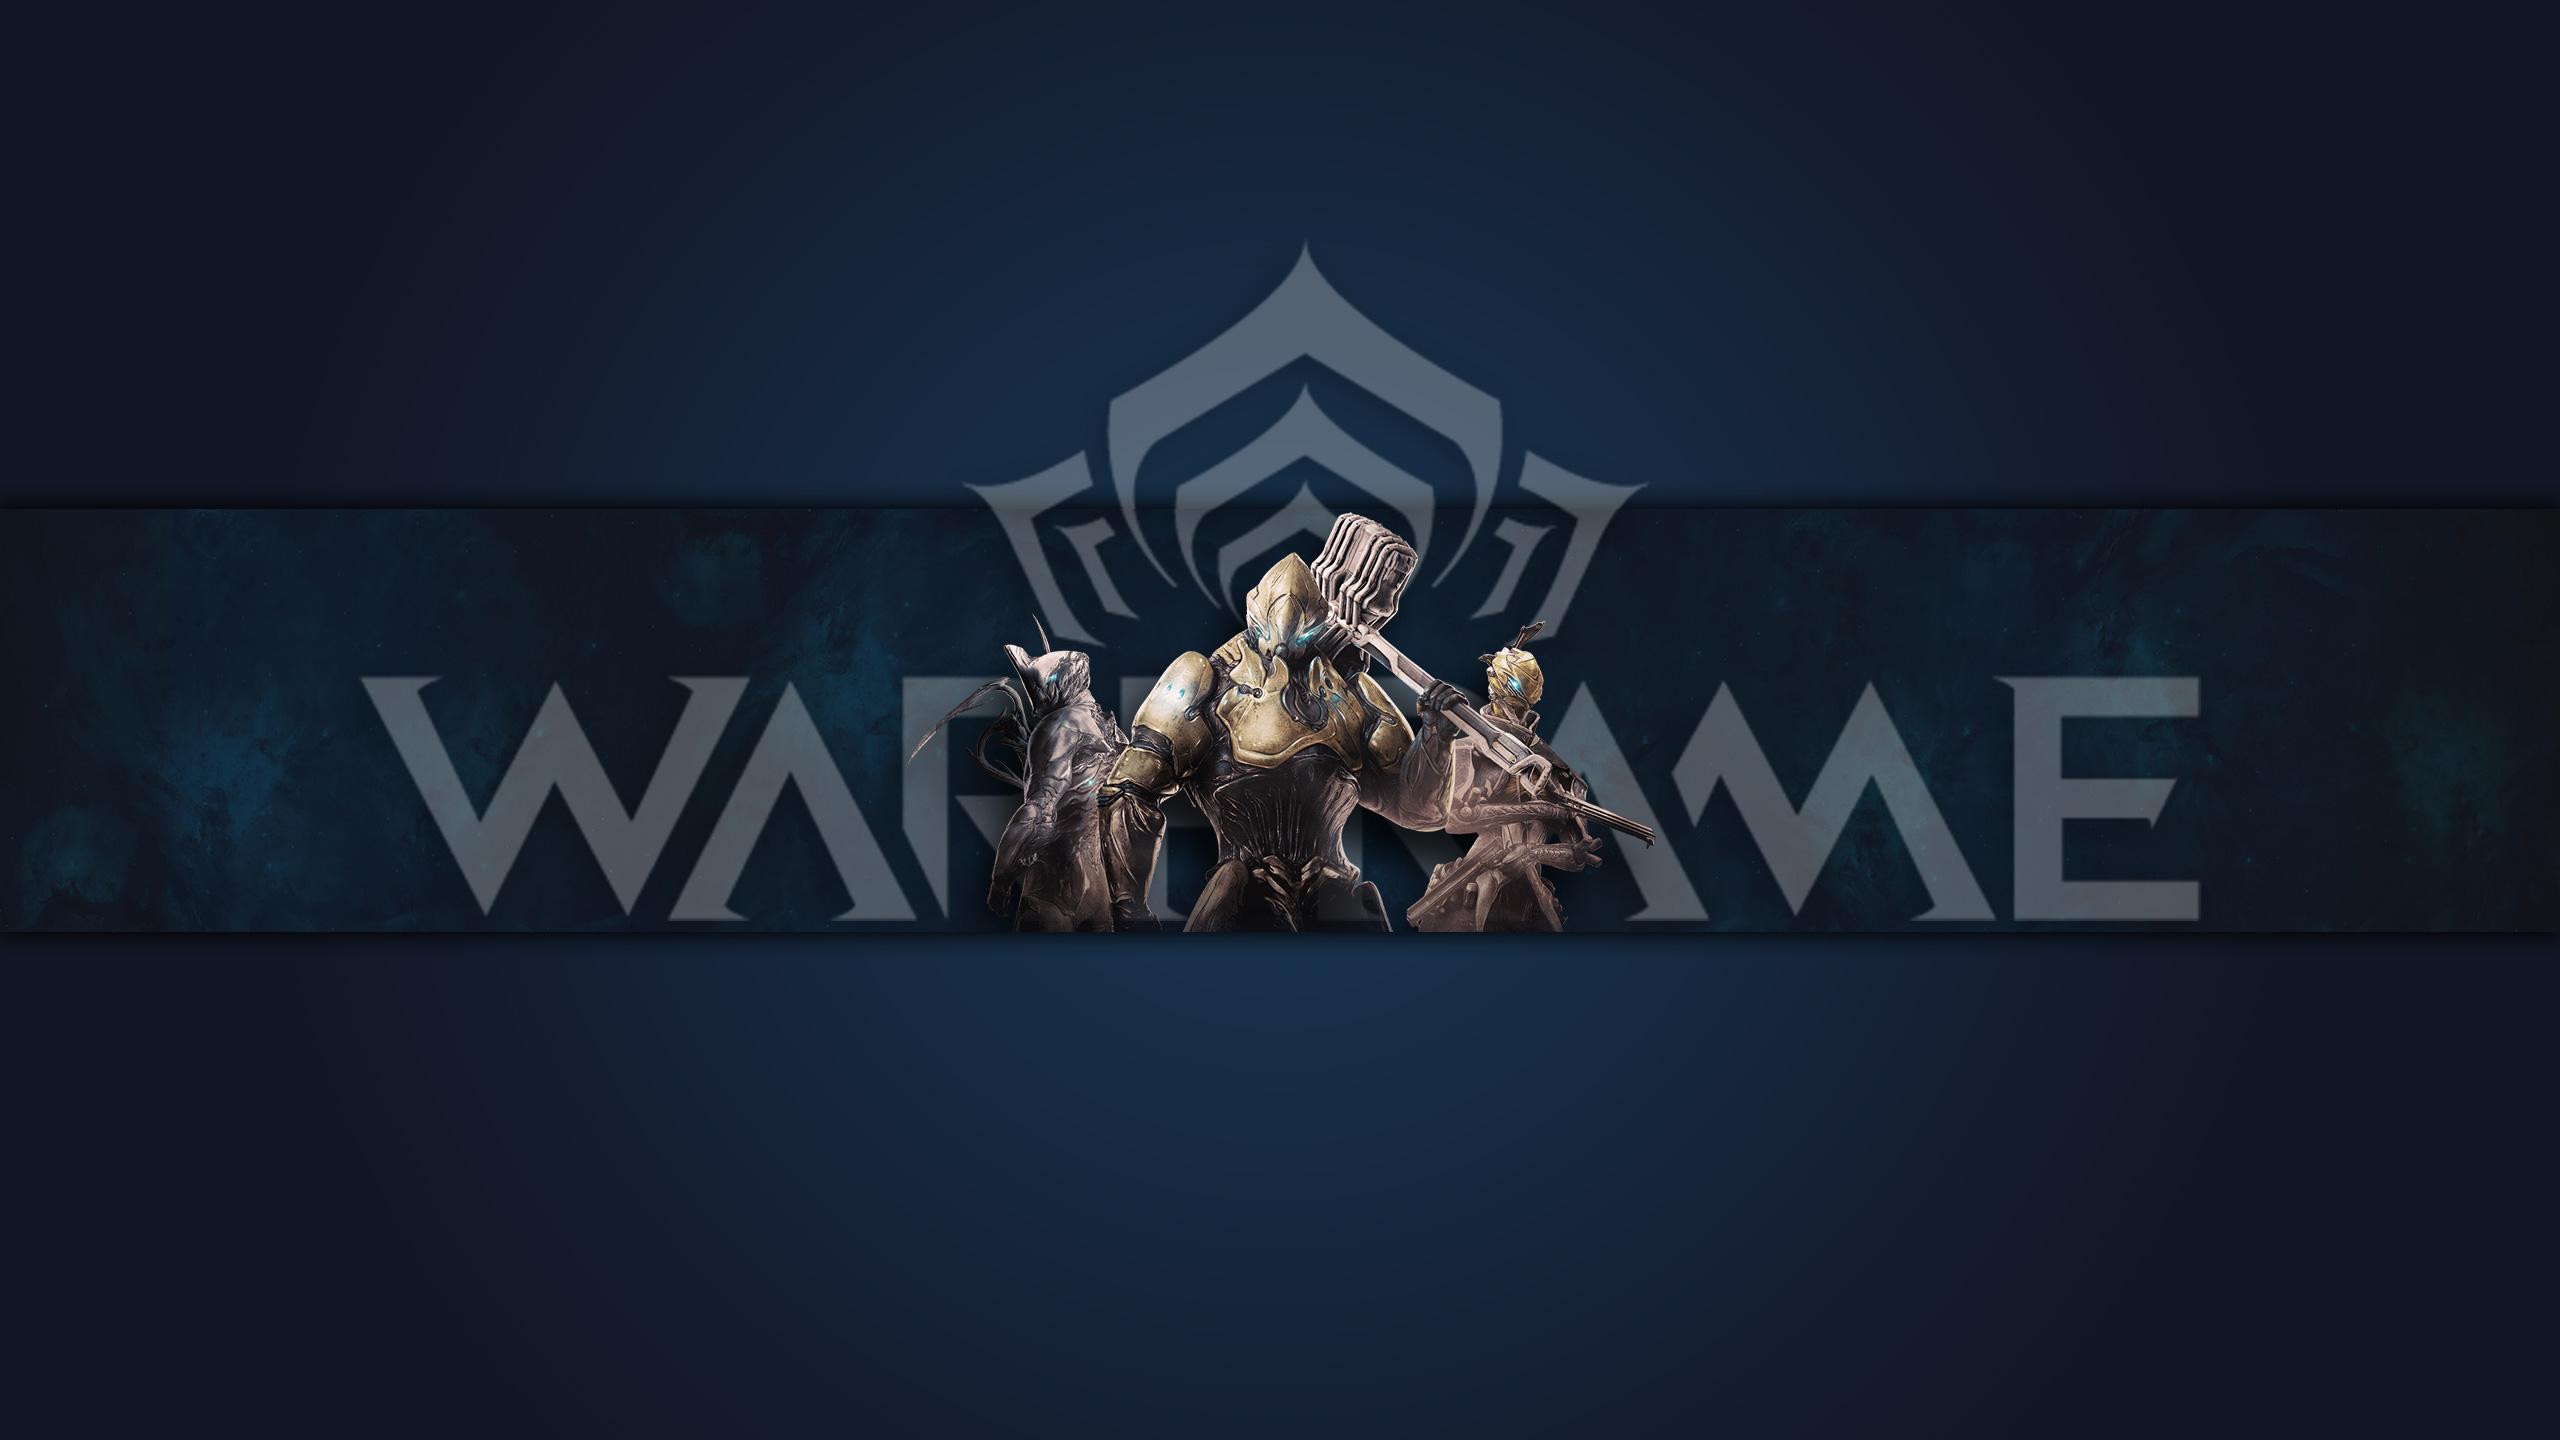 Картинка темно синий фон для игровой шапки ютуба с текстом warframe и логотипом фортуна